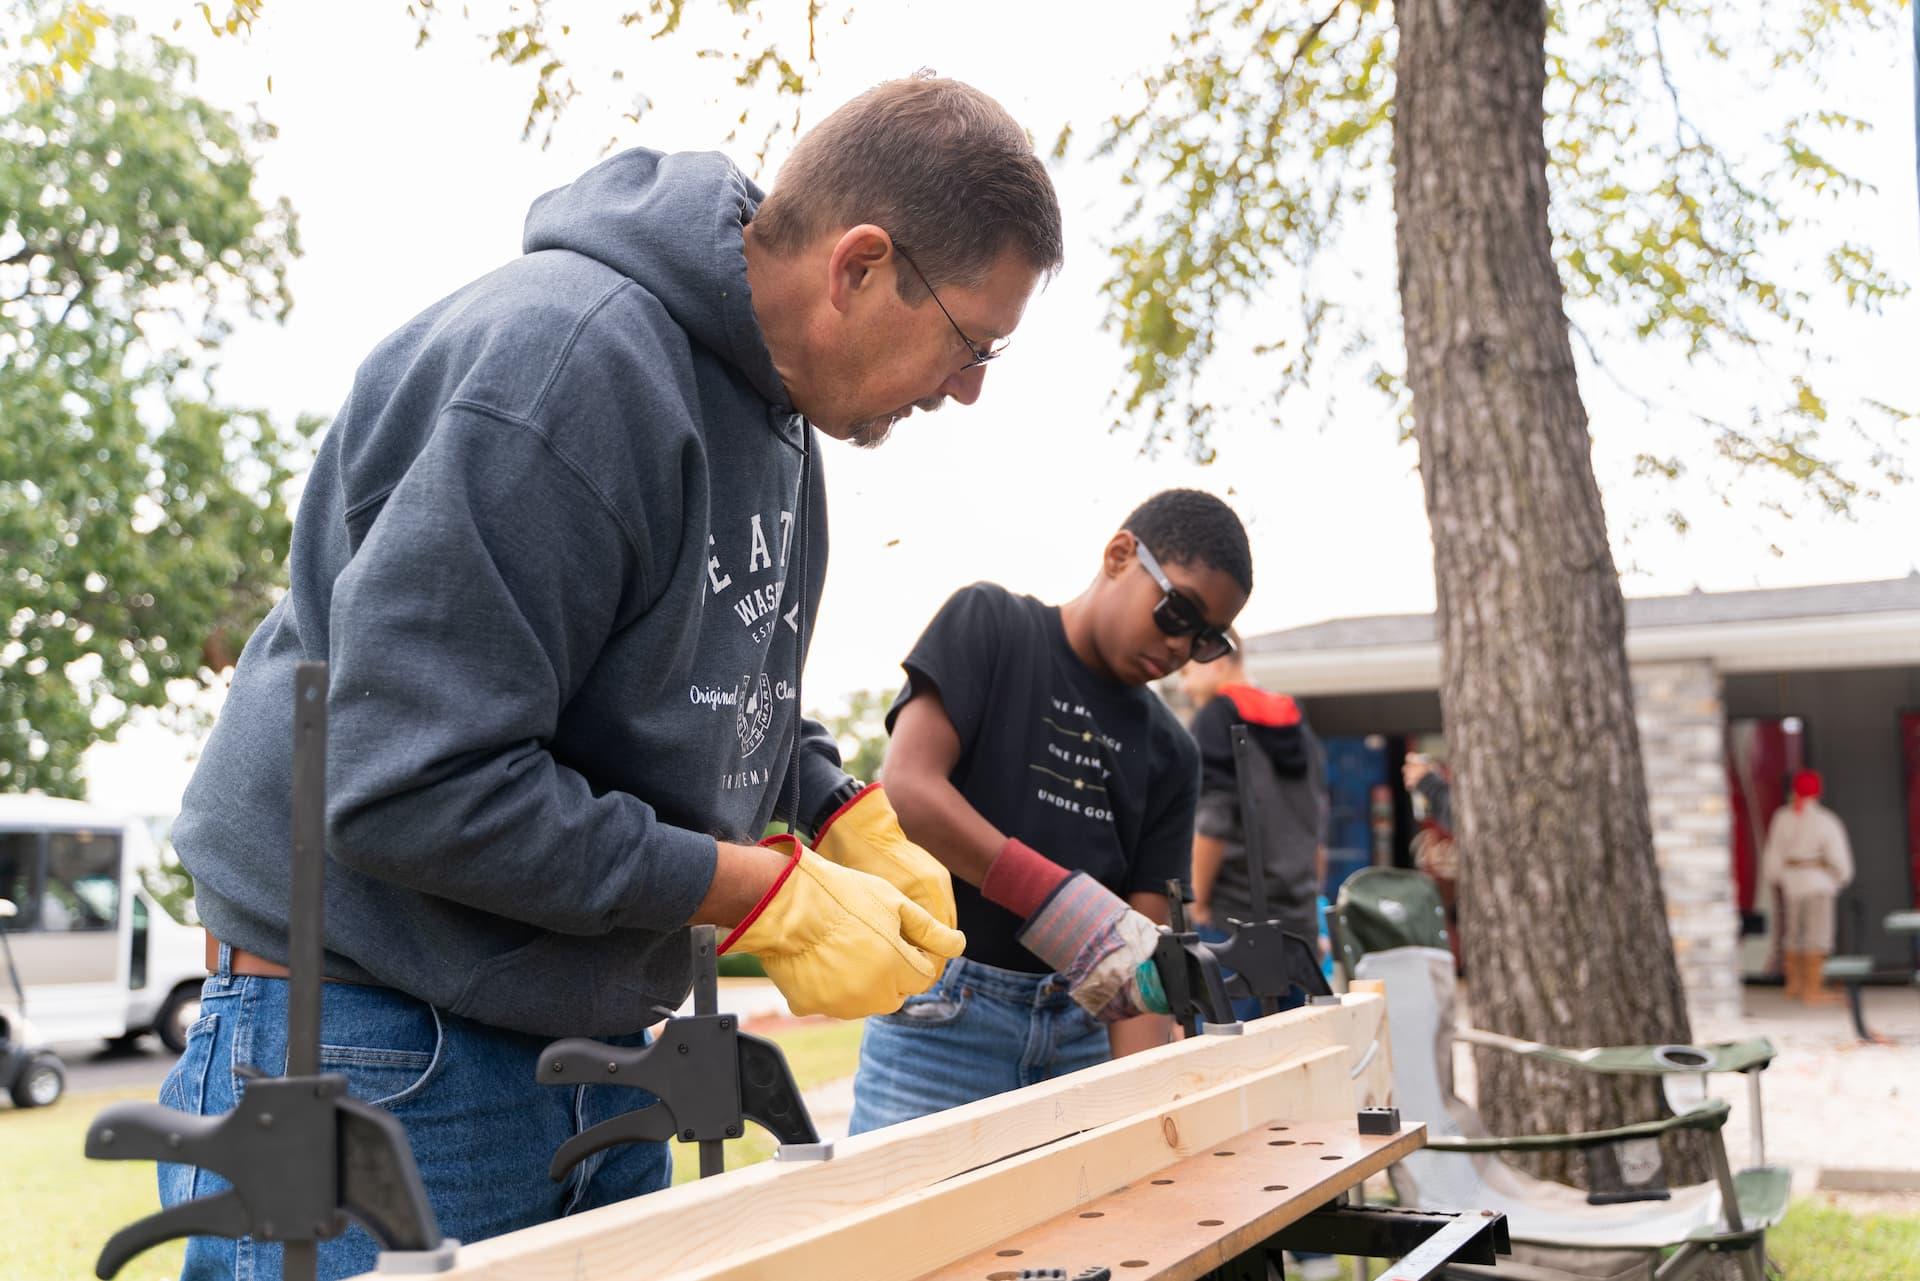 Men's Summit Activity. Man in gray sweatshirt teaching boy in black shirt how to work with wood